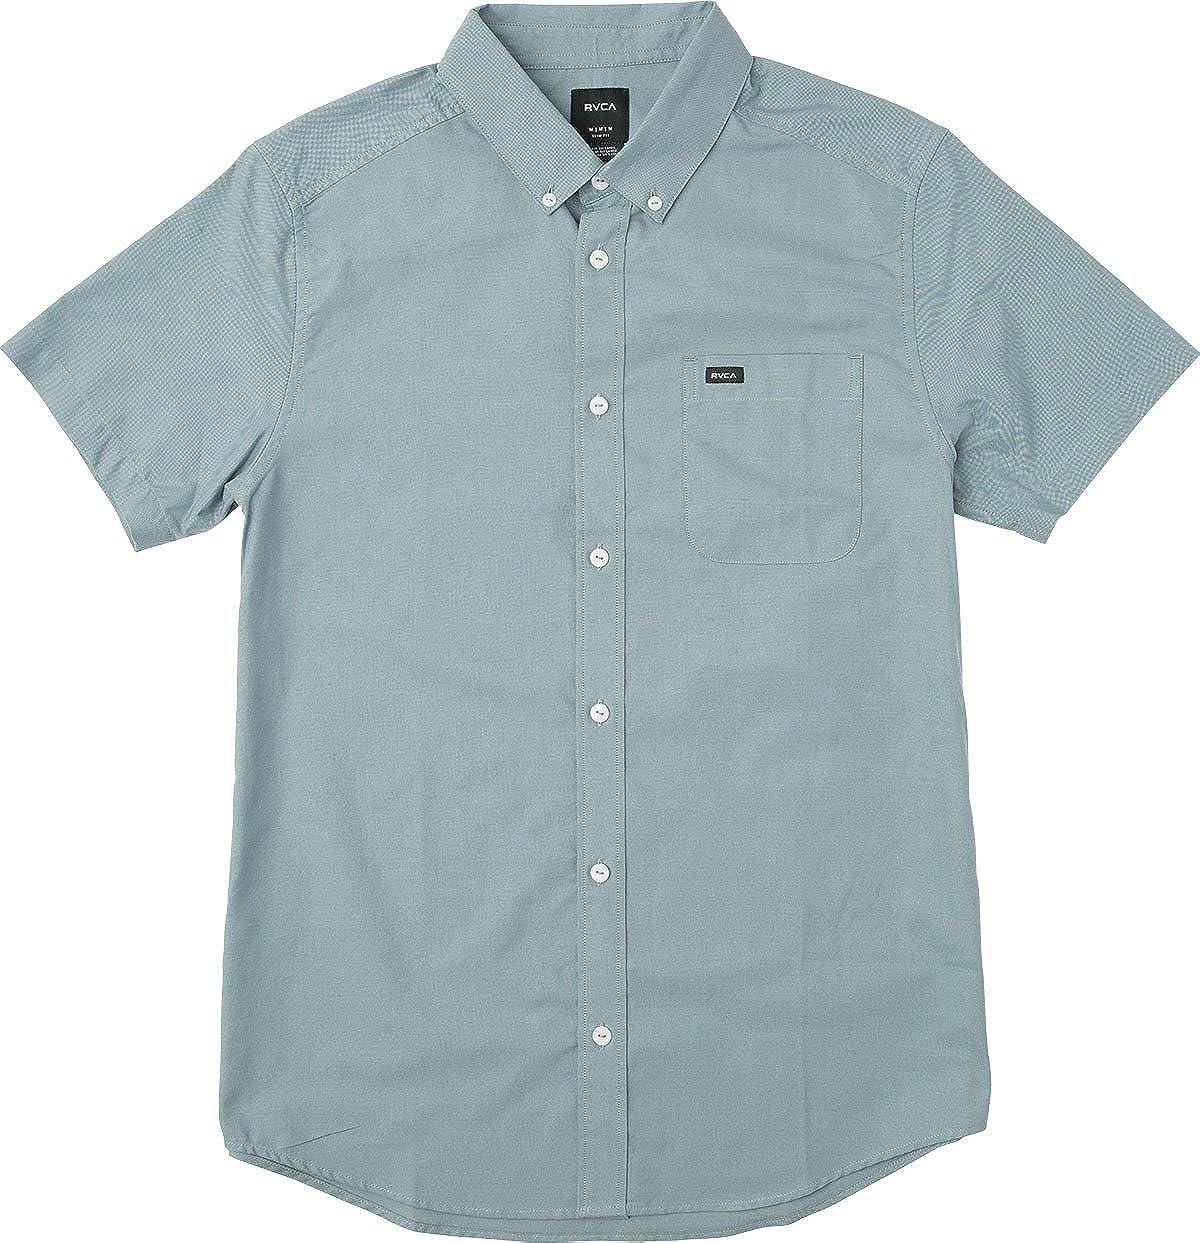 RVCA Mens Thatll Do Oxford Short Sleeve Woven Shirt